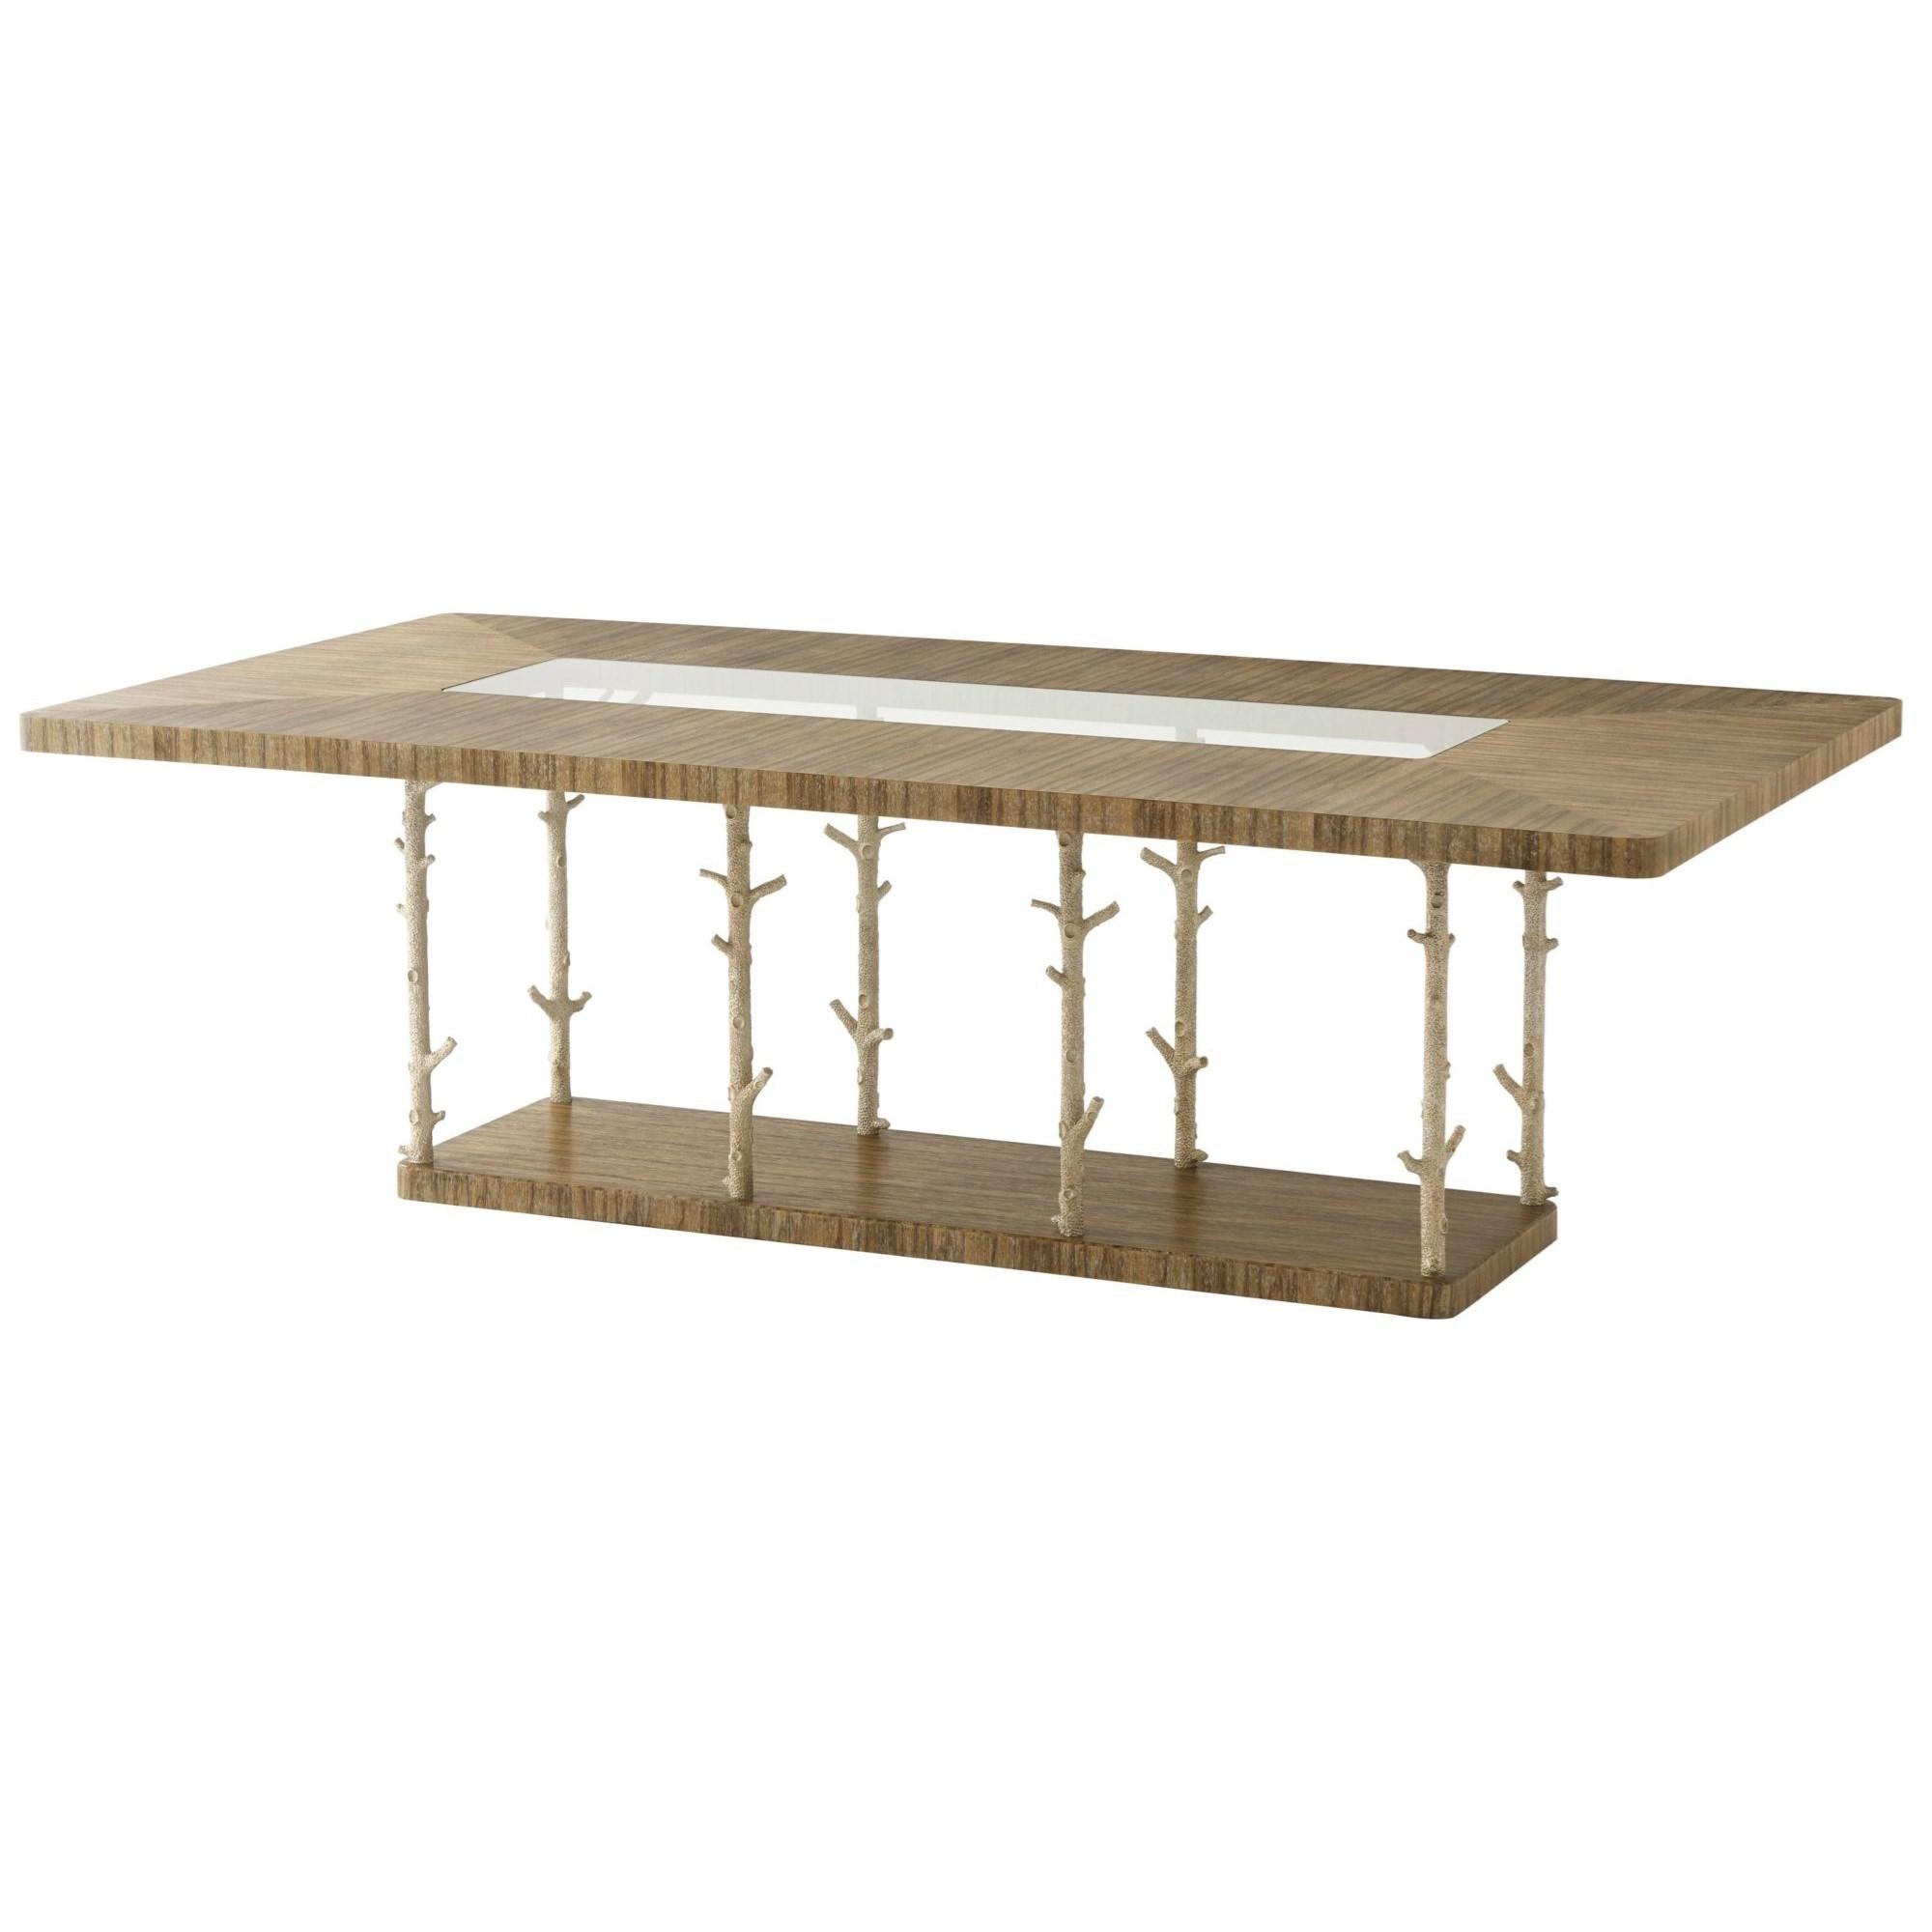 Theodore Alexander Corallo Wynwood II Rectangular Dining Table - Item Number: 5405-322CHC